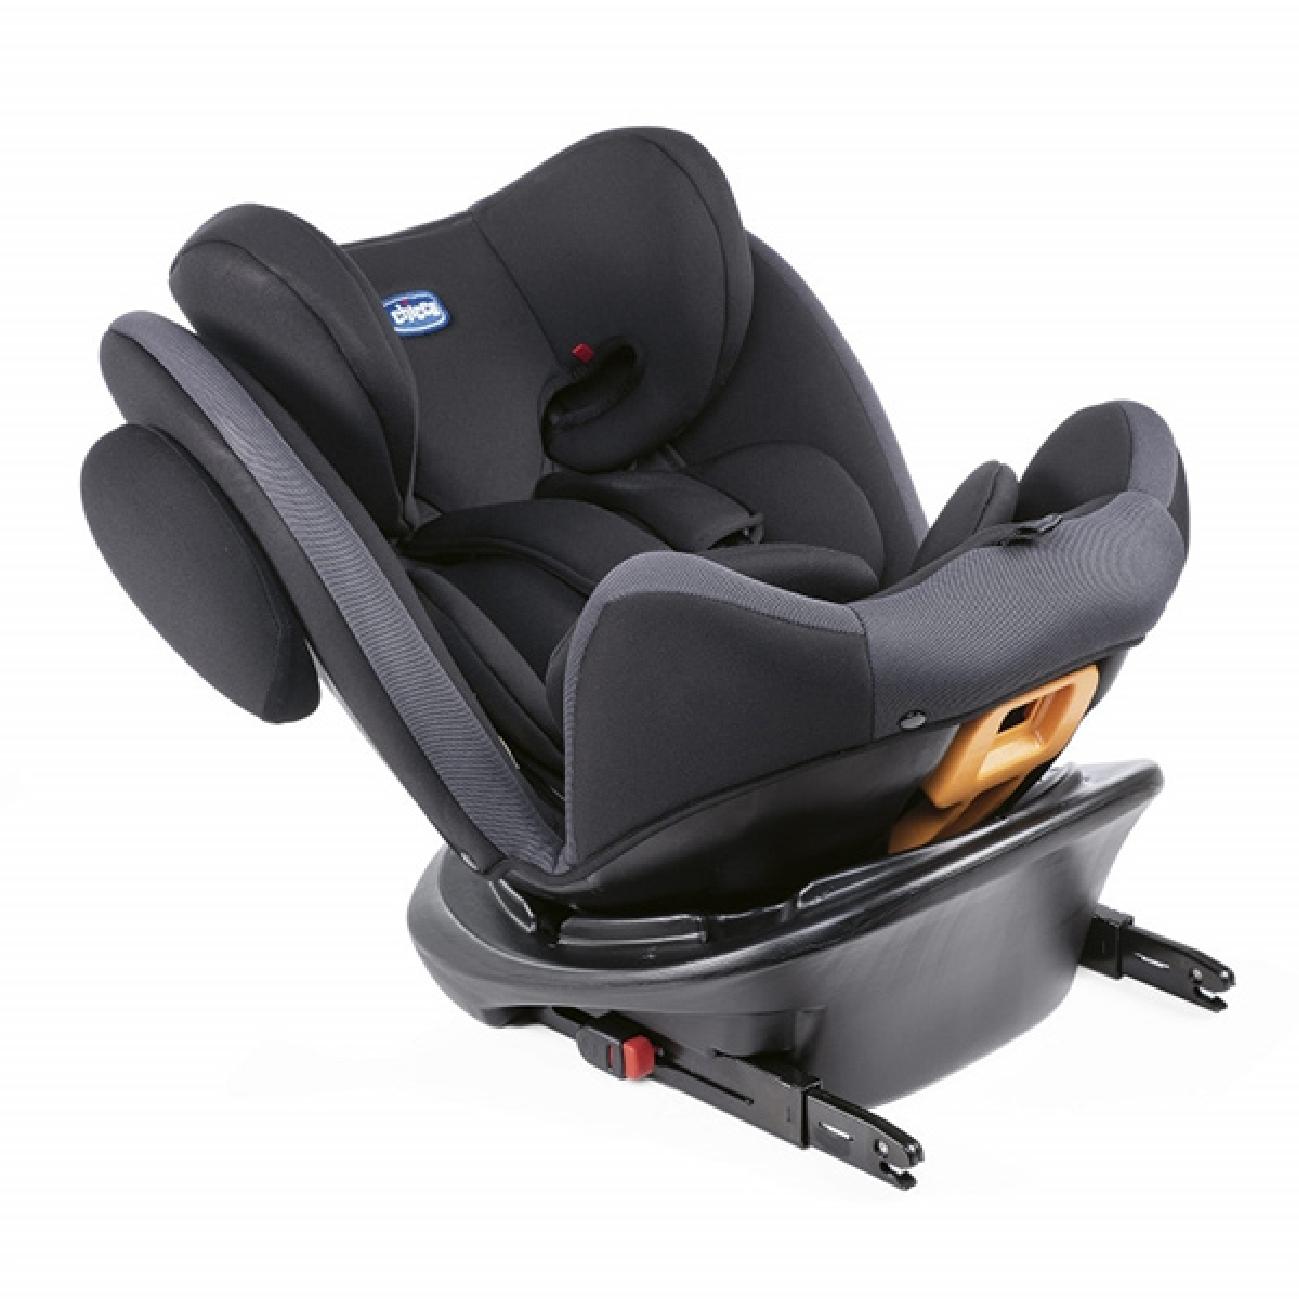 Lot 207_Chicco Unico Car Seat-Jet Black-2